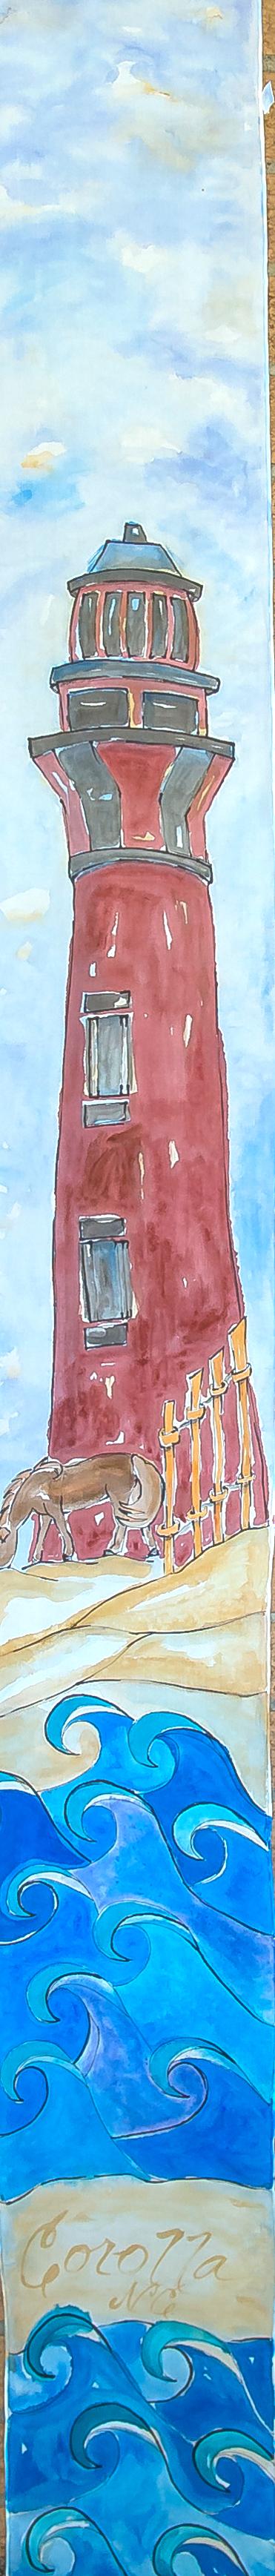 "Whimsical Currituck Lighthouse 14""x72"" $75"